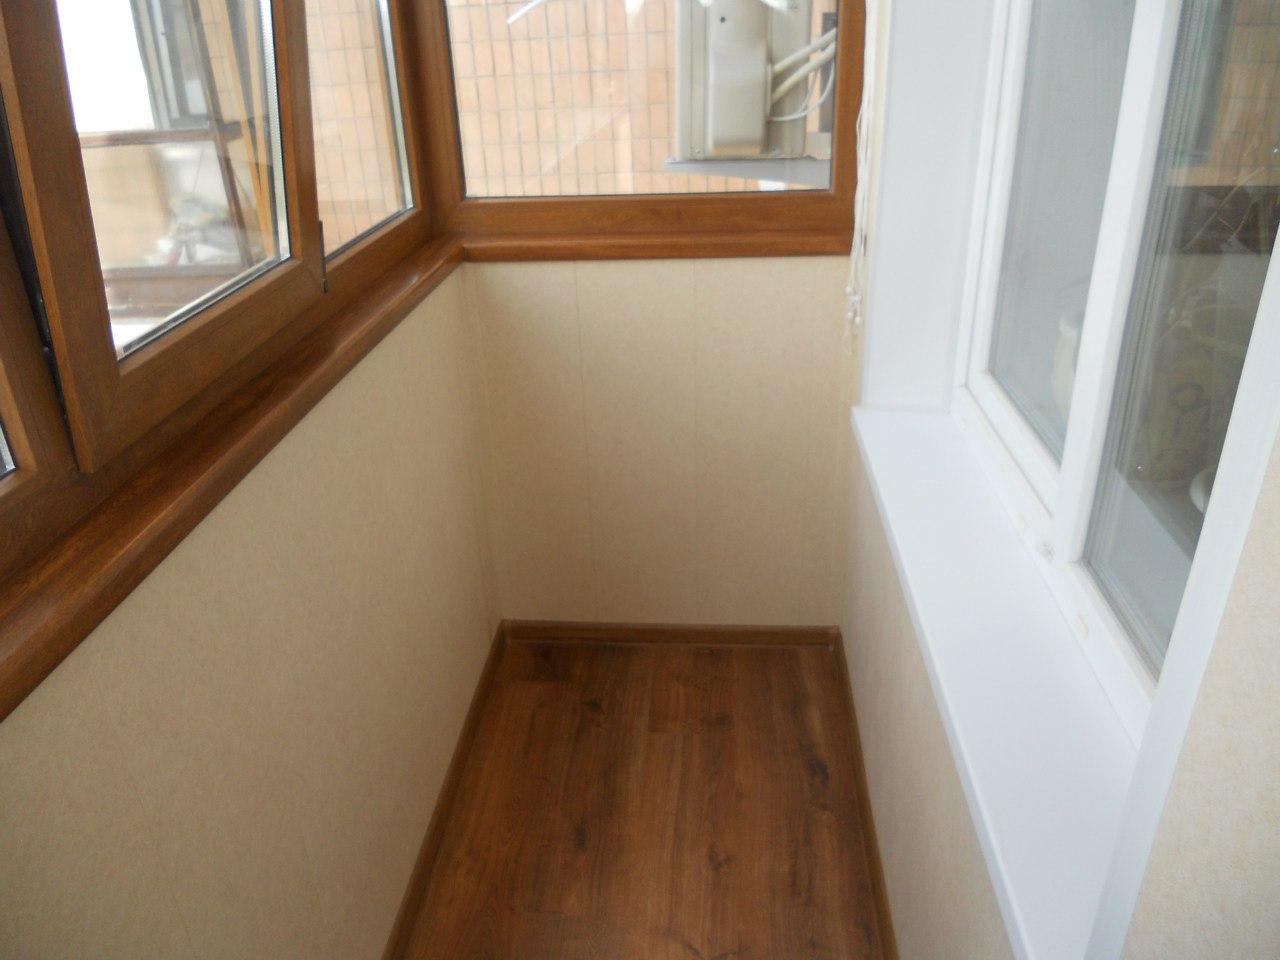 Обшитый балкон в доме 65 10.